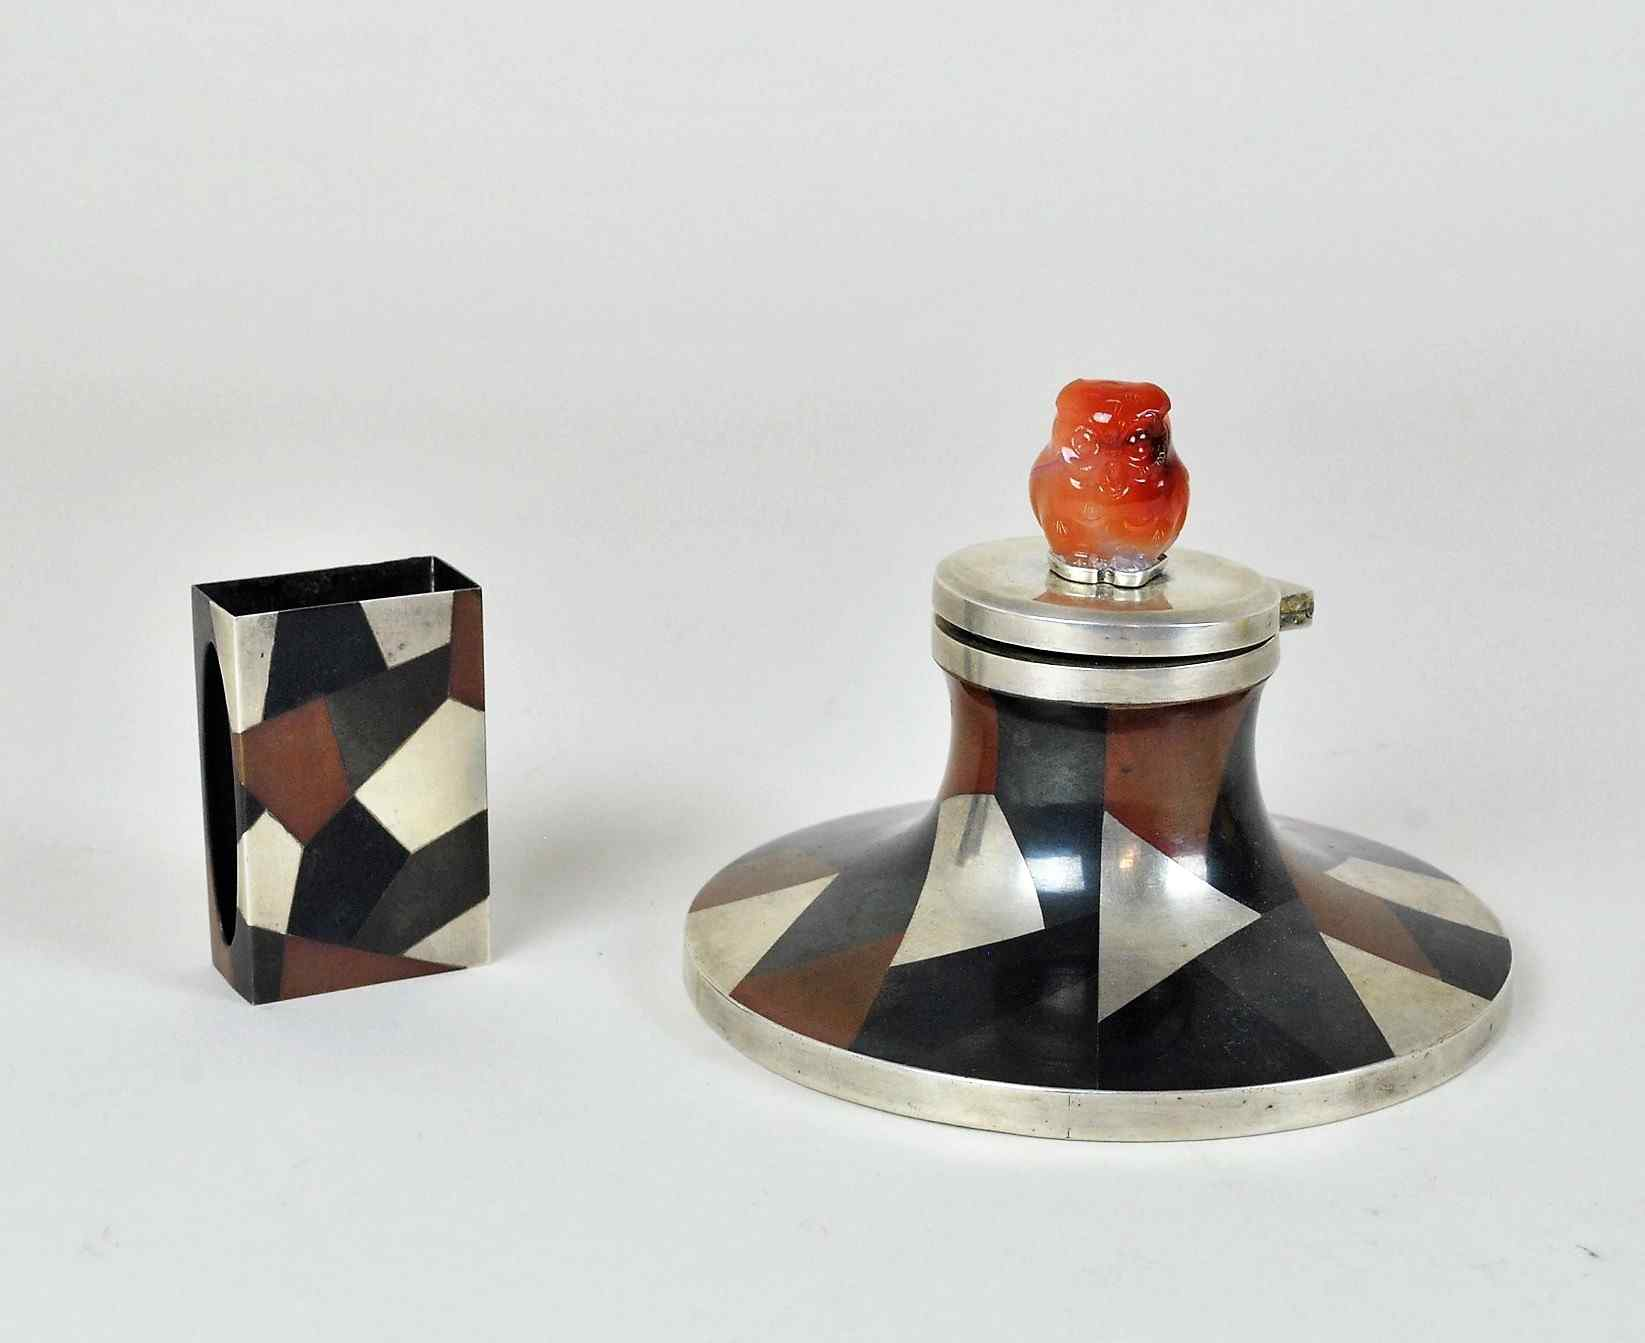 Calamaio e scatola di fiammiferi smaltati, Yamanaka, art déc